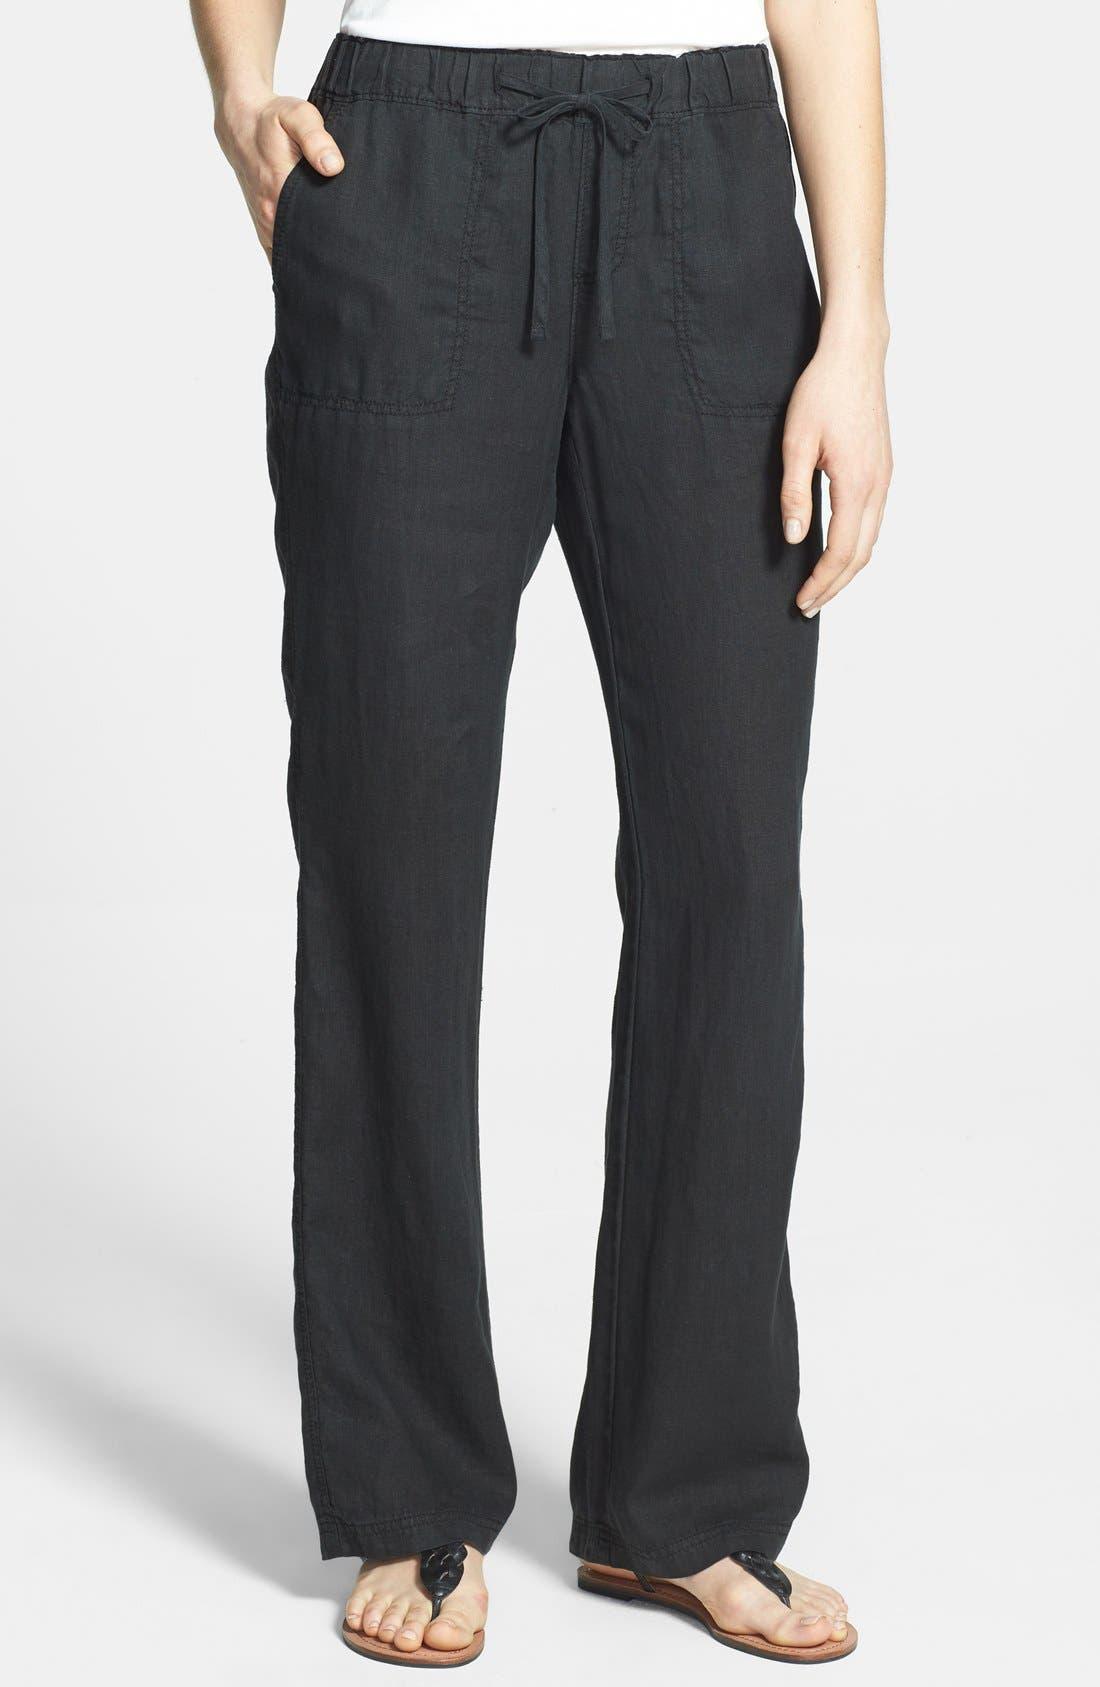 Drawstring Waist Linen Pants,                             Main thumbnail 1, color,                             001